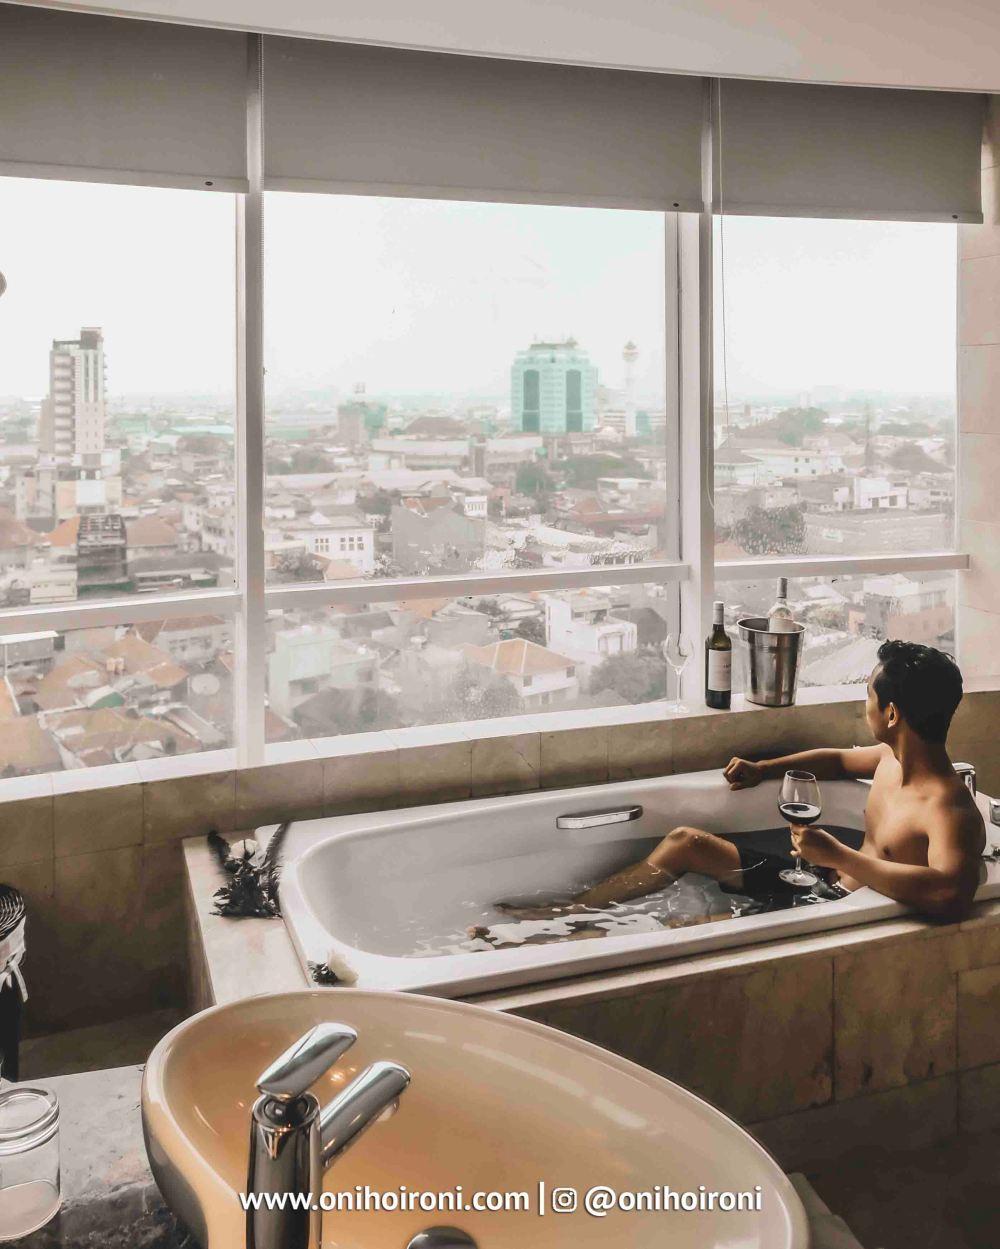 3 Room bathtubCrowne Plaza Bandung Oni Hoironi